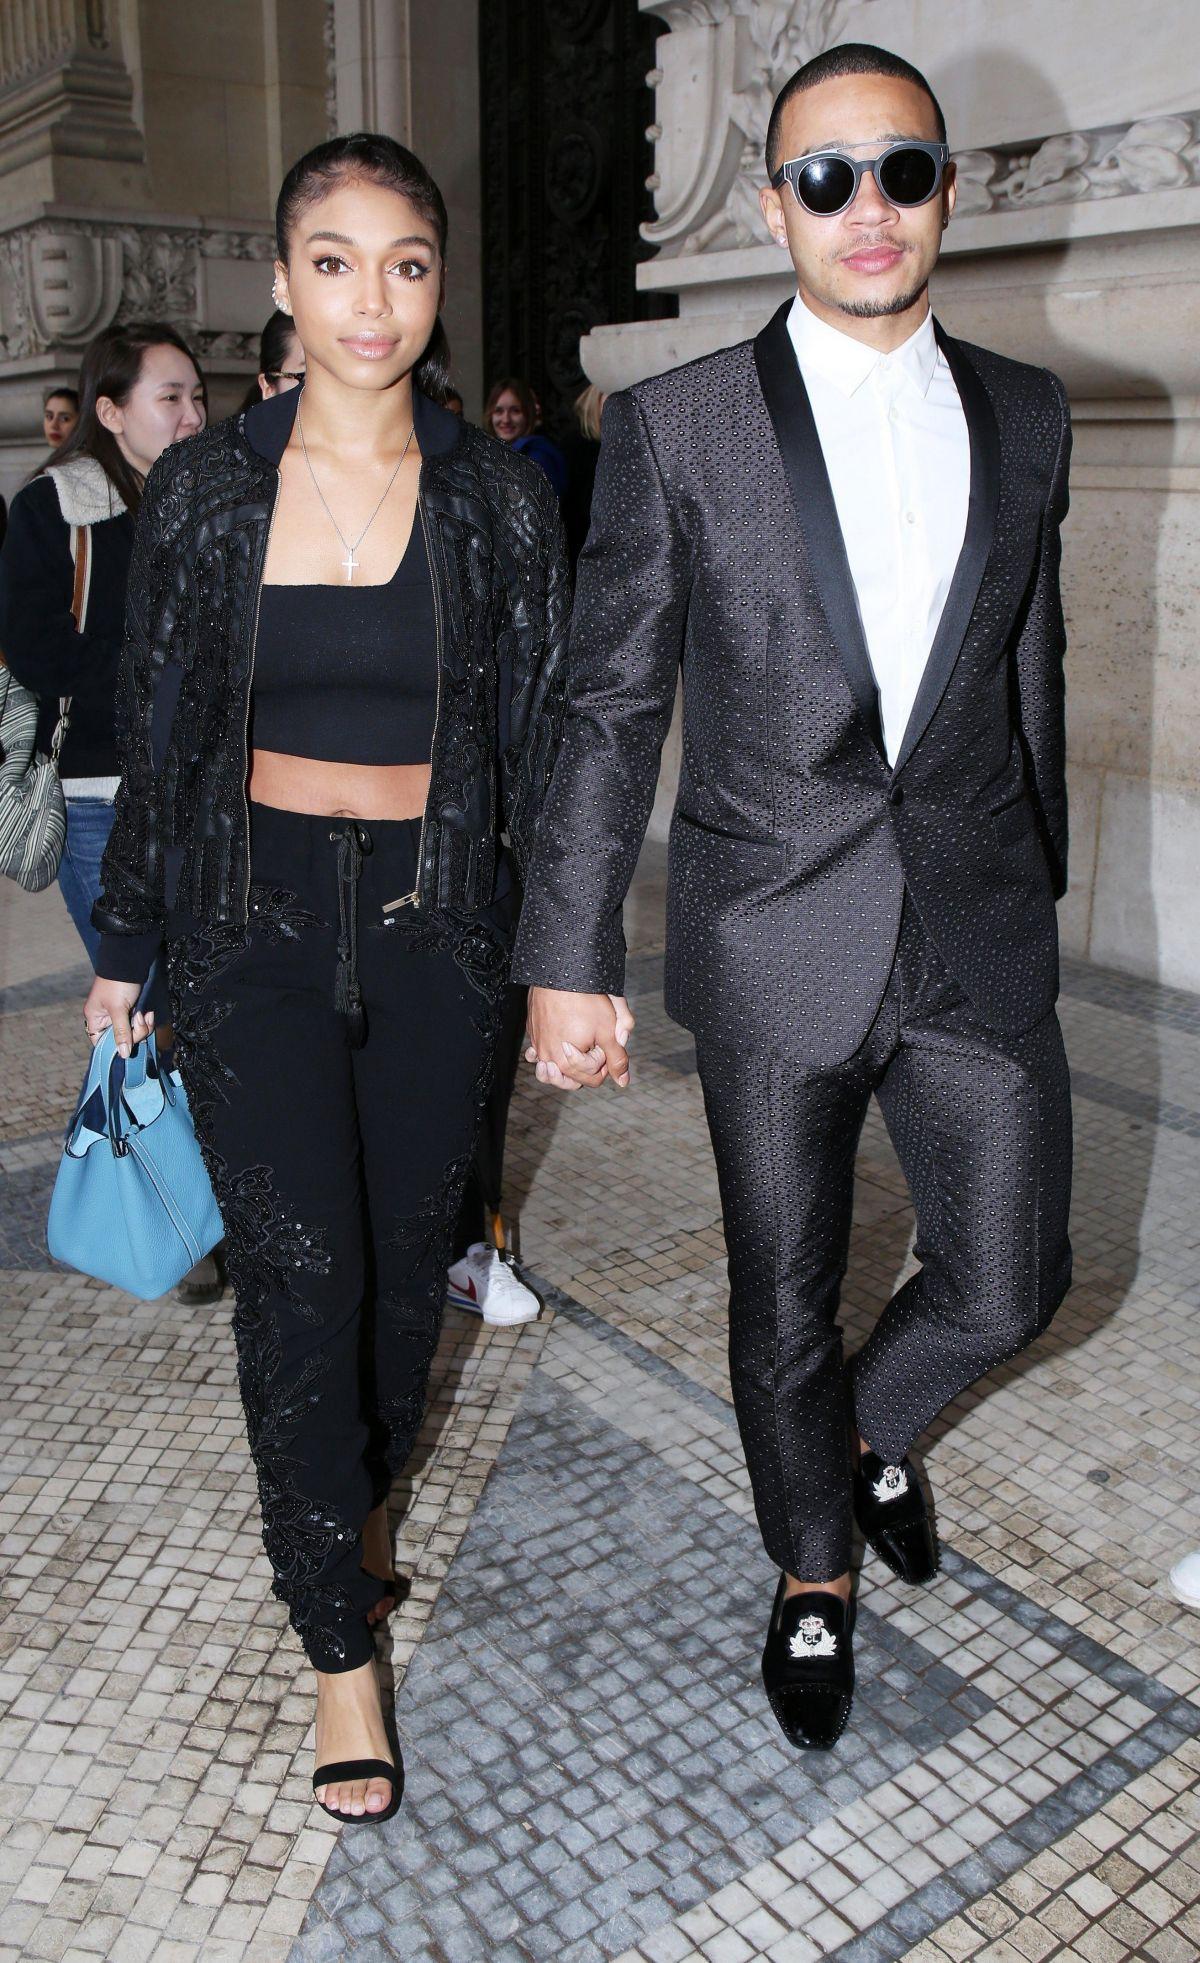 LORI HARVEY Arrives at Elie Saab Fashion Show in Paris 03/04/2017